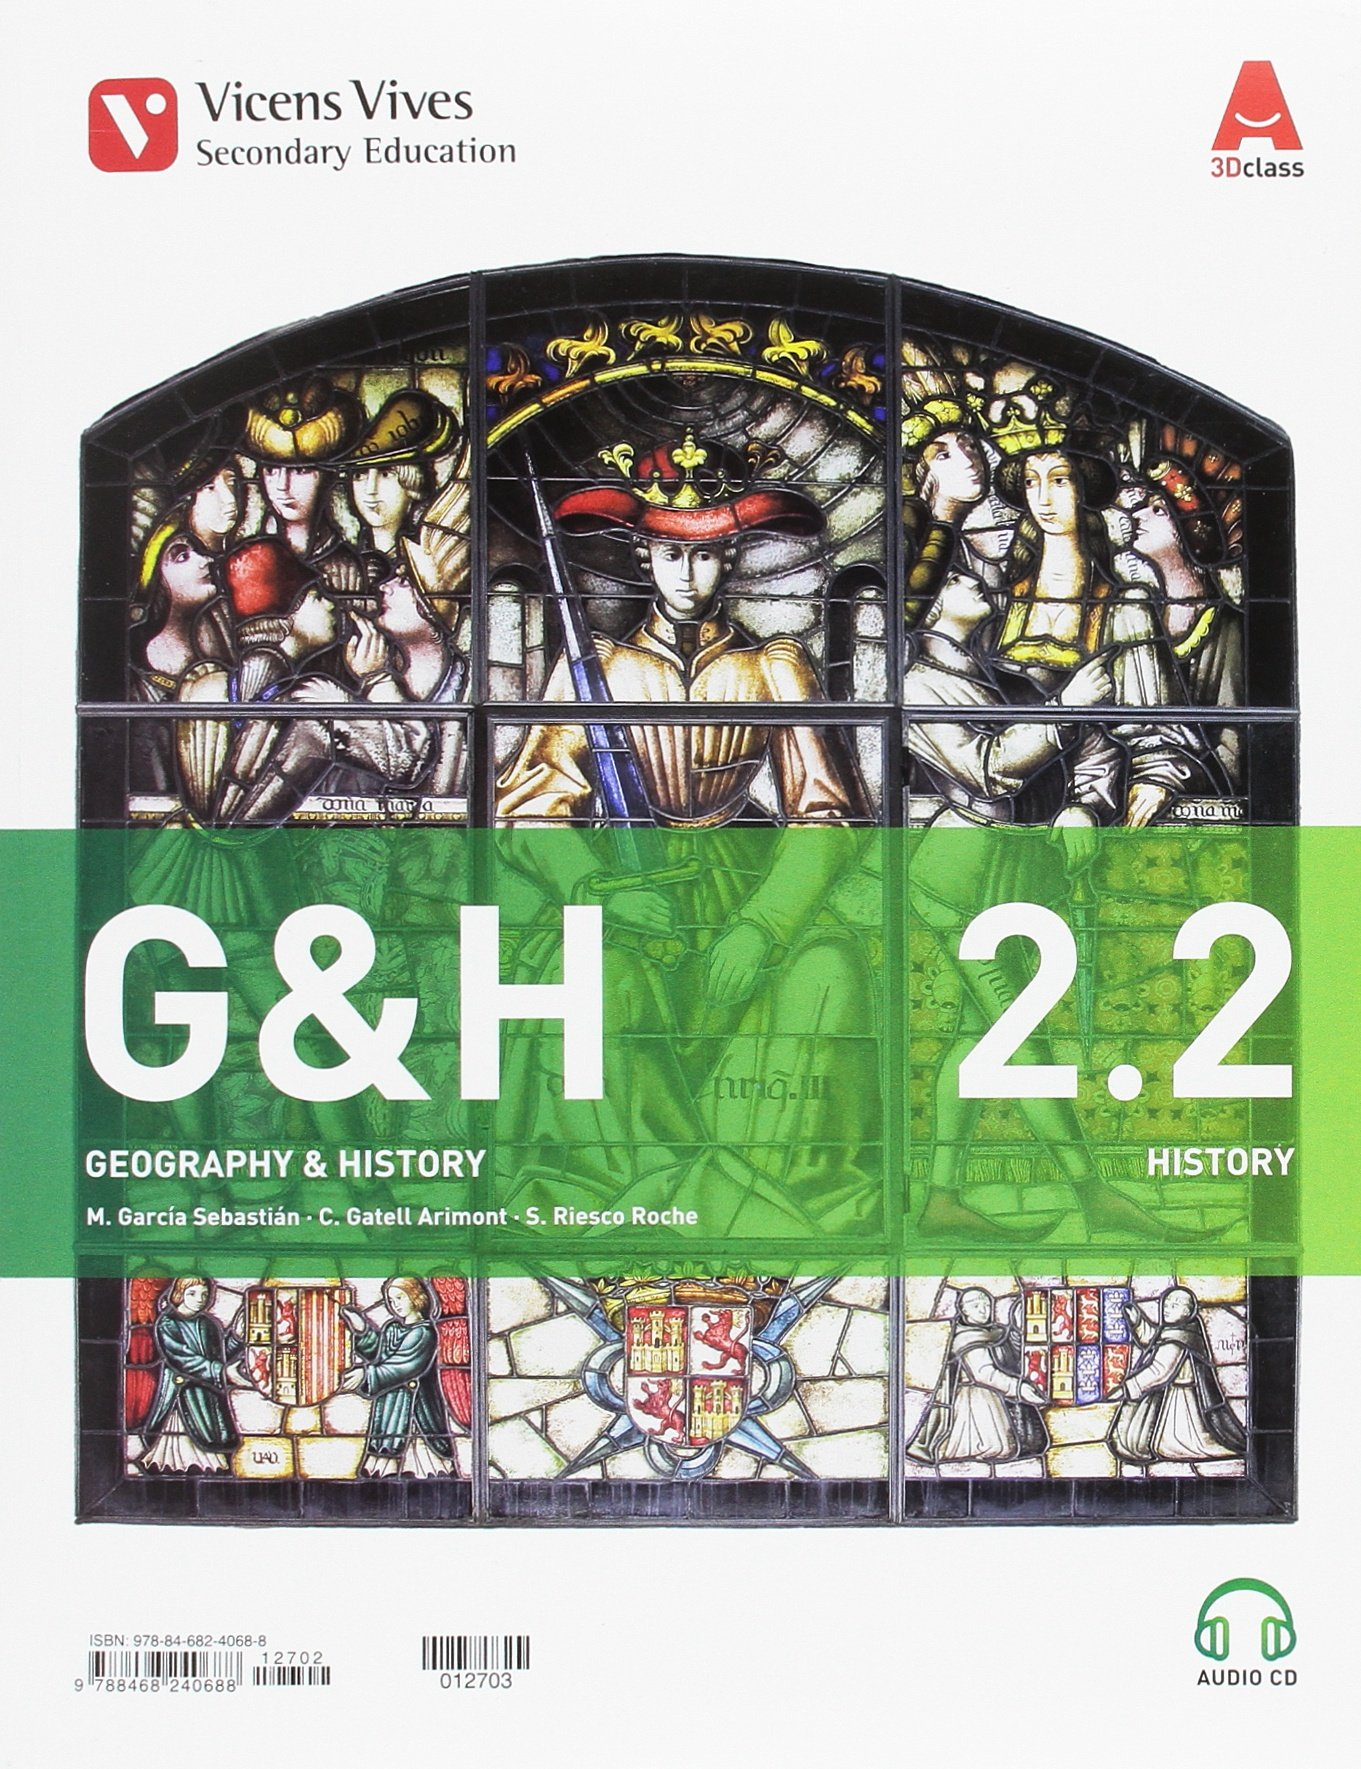 G&H 2.2 & 2.1 (HISTORY) 3D CLASS: Amazon.es: Garcia Sebastian ...